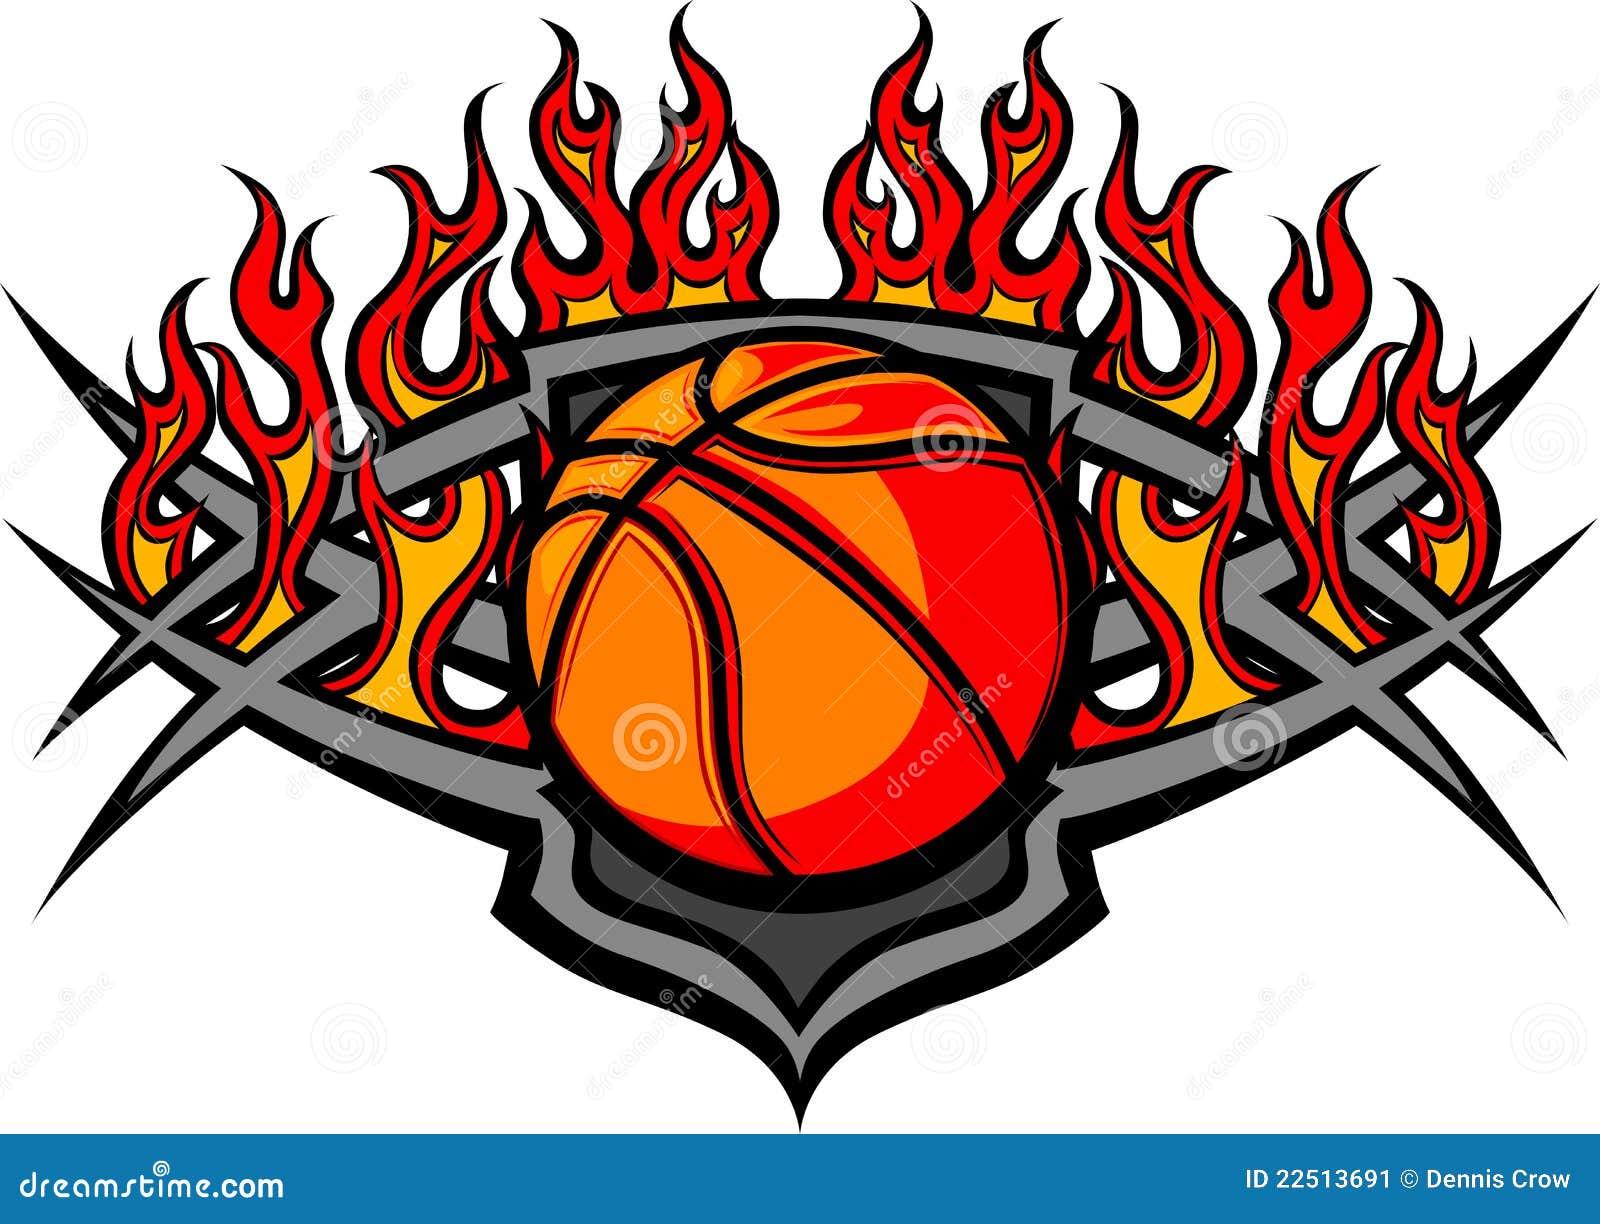 Basketball Ball Template With Flames Image Stock Image